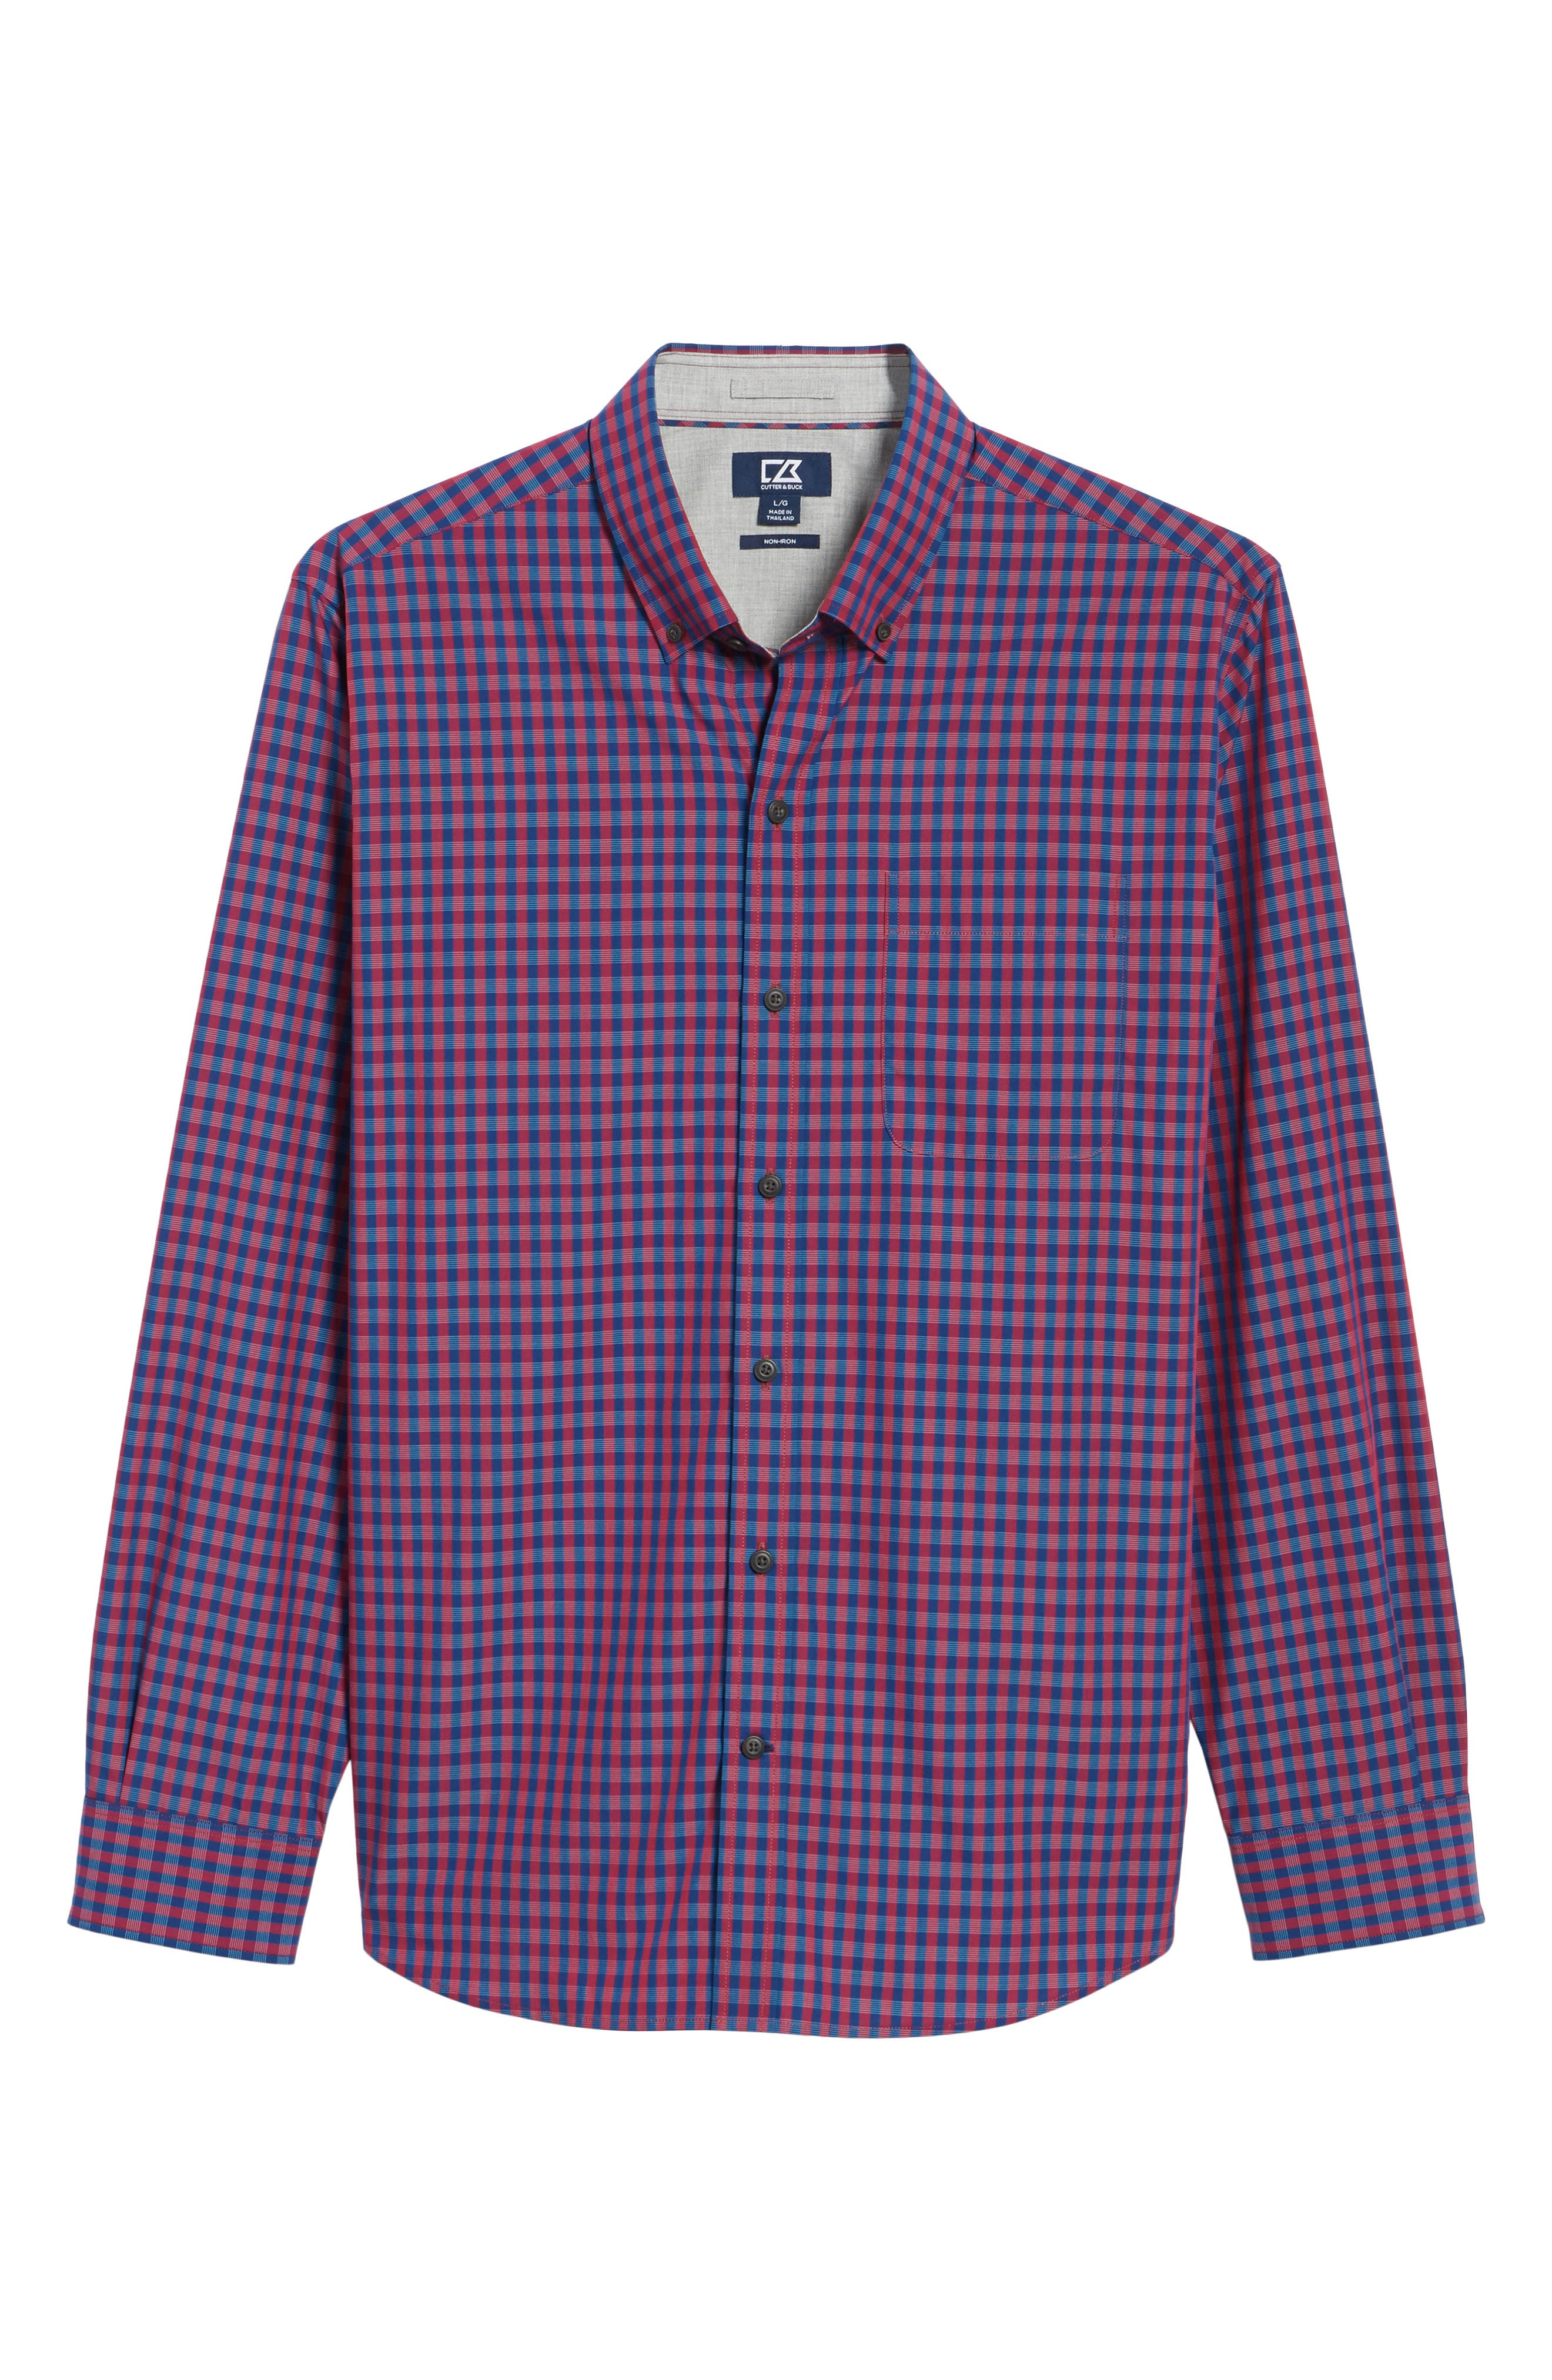 Myles Non-Iron Check Sport Shirt,                             Alternate thumbnail 6, color,                             691